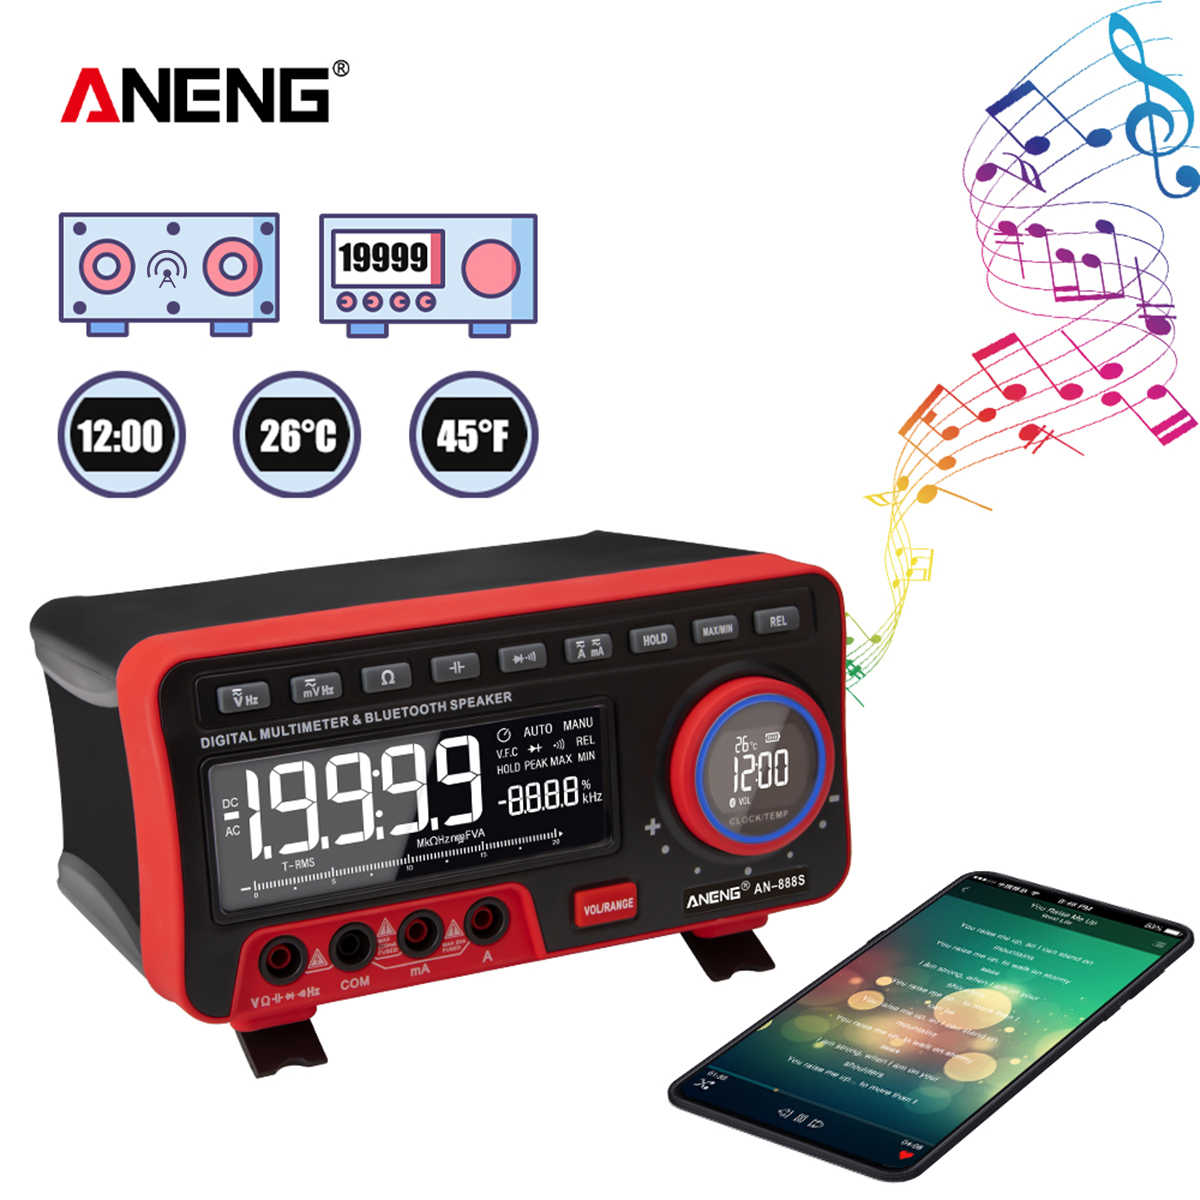 ANENG AN888S BT Audio มัลติมิเตอร์นาฬิกาปลุกดิจิตอลจอแสดงผลแรงดันไฟฟ้า Meter 19999 นับช่วงอัตโนมัติ Universal เมตร